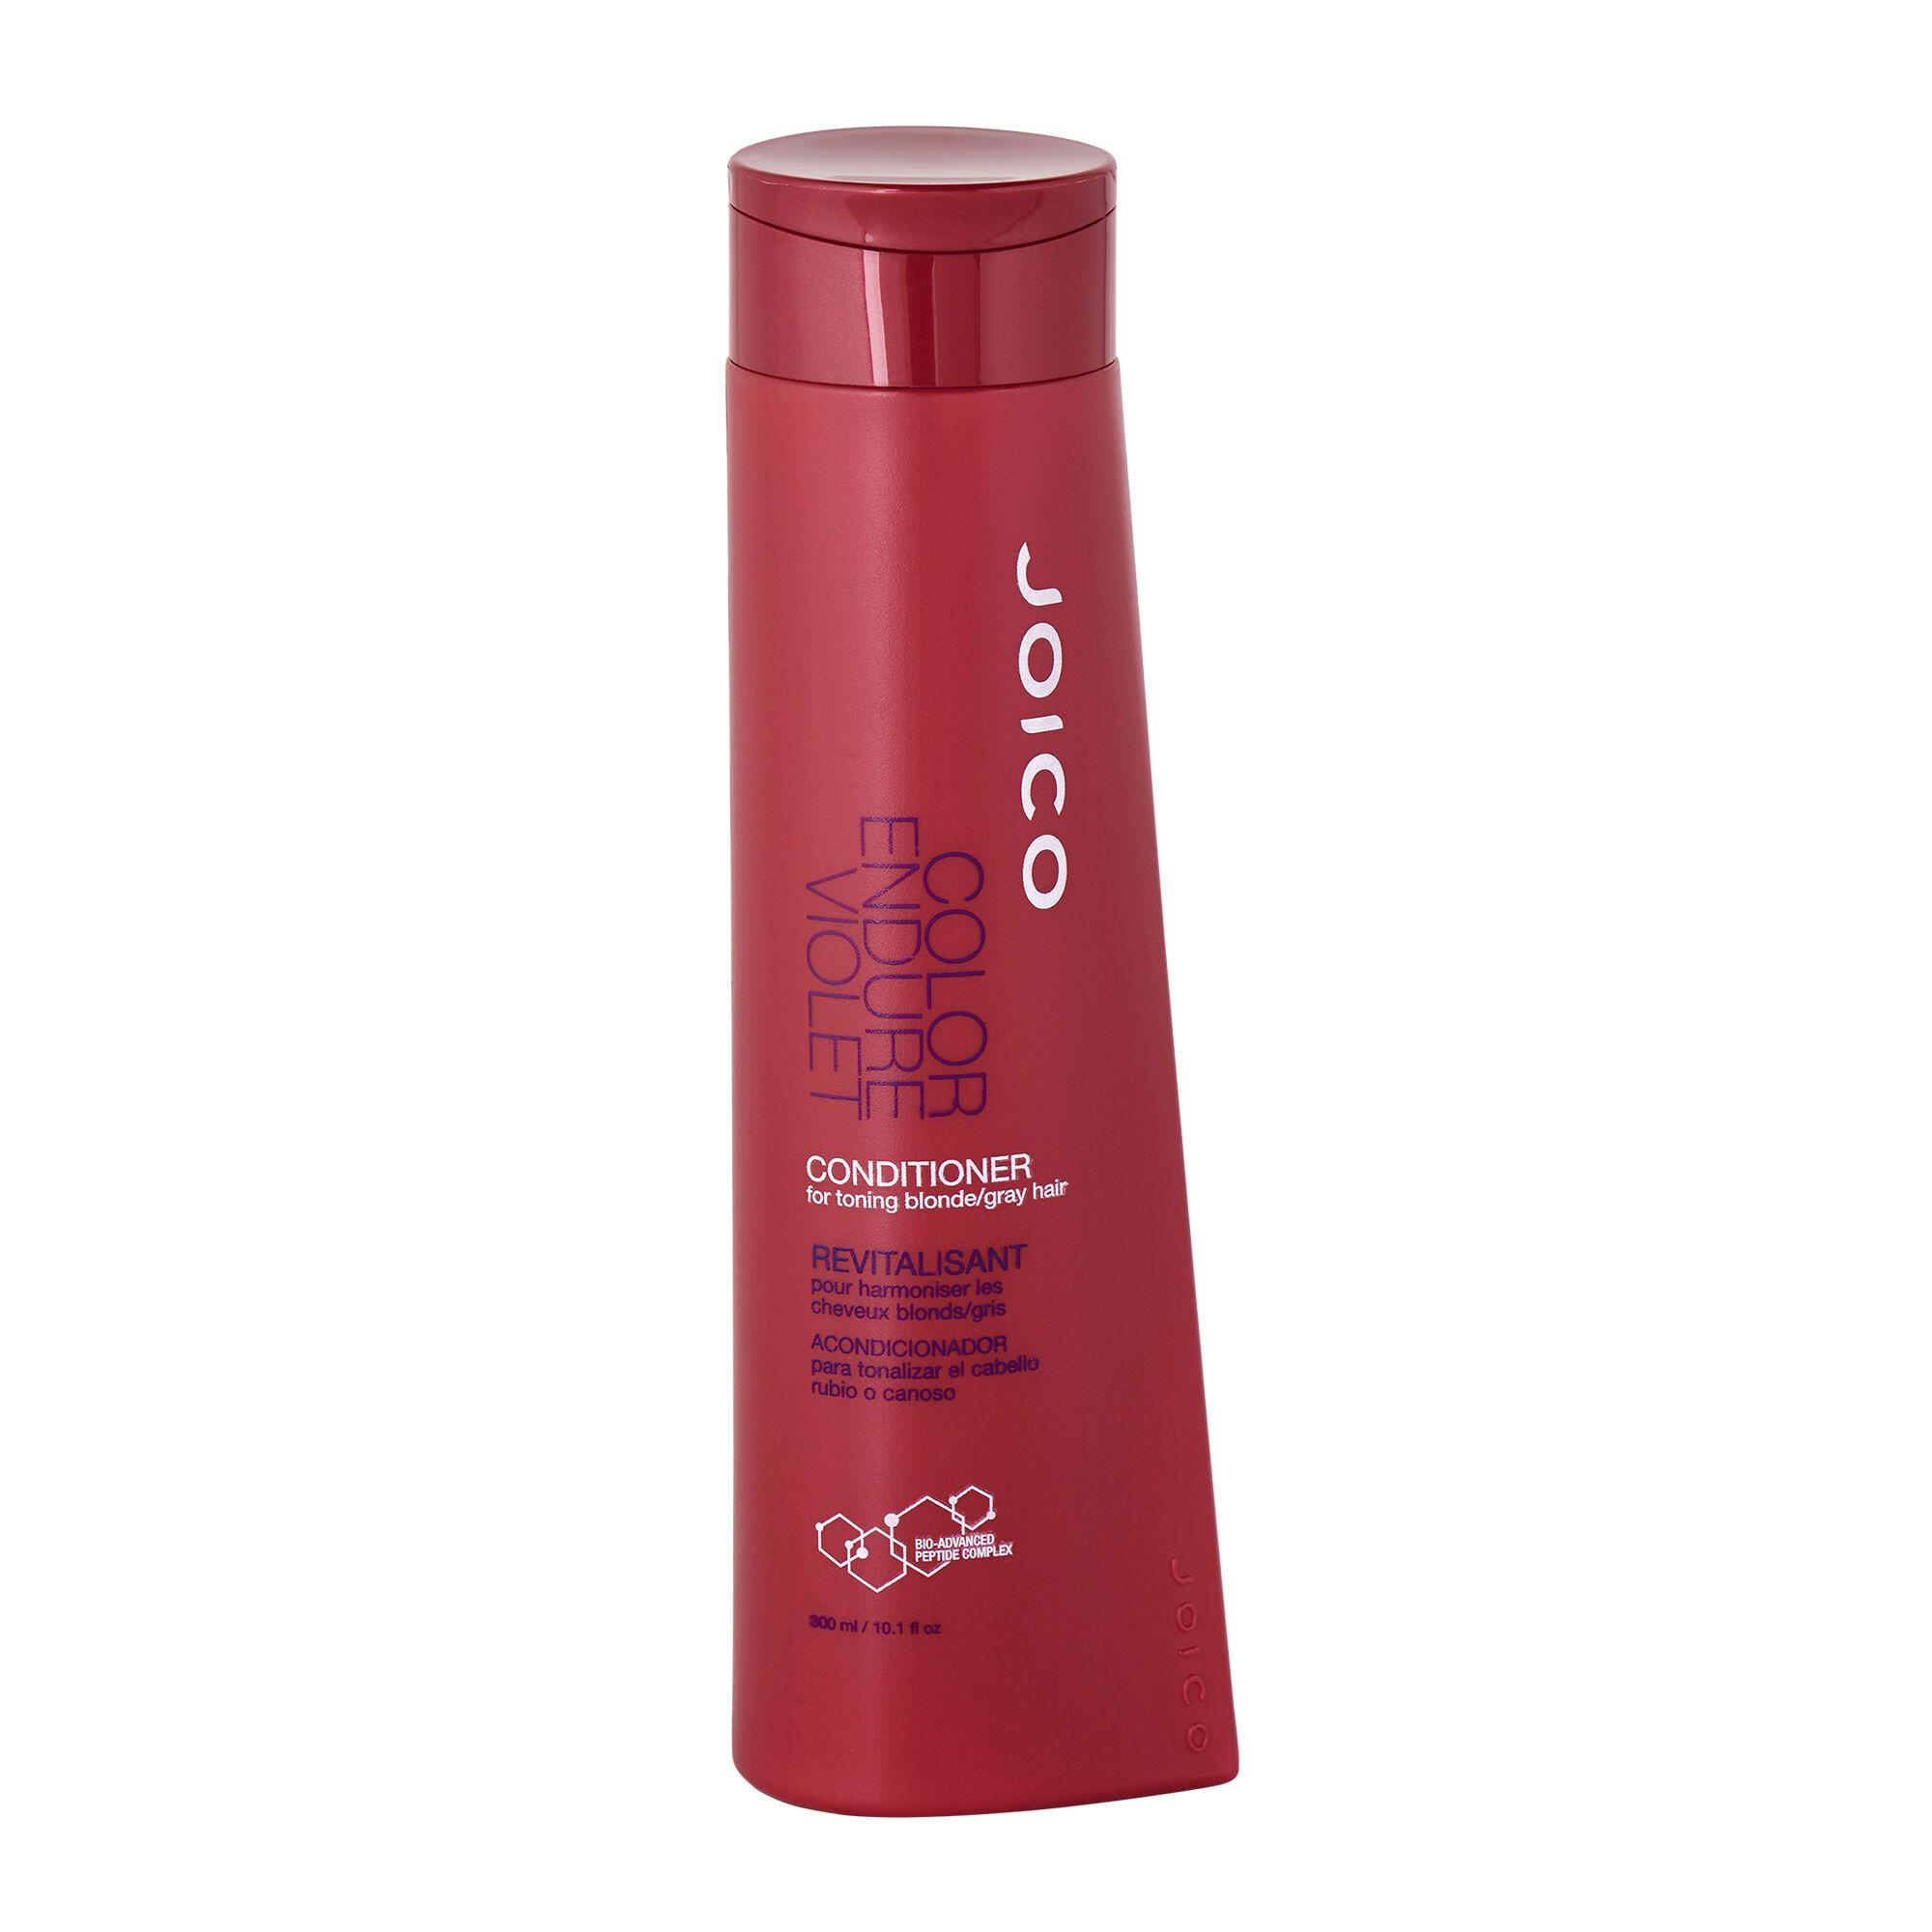 Joico Colour Endure Violet Sulfate Free Conditioner 300ml